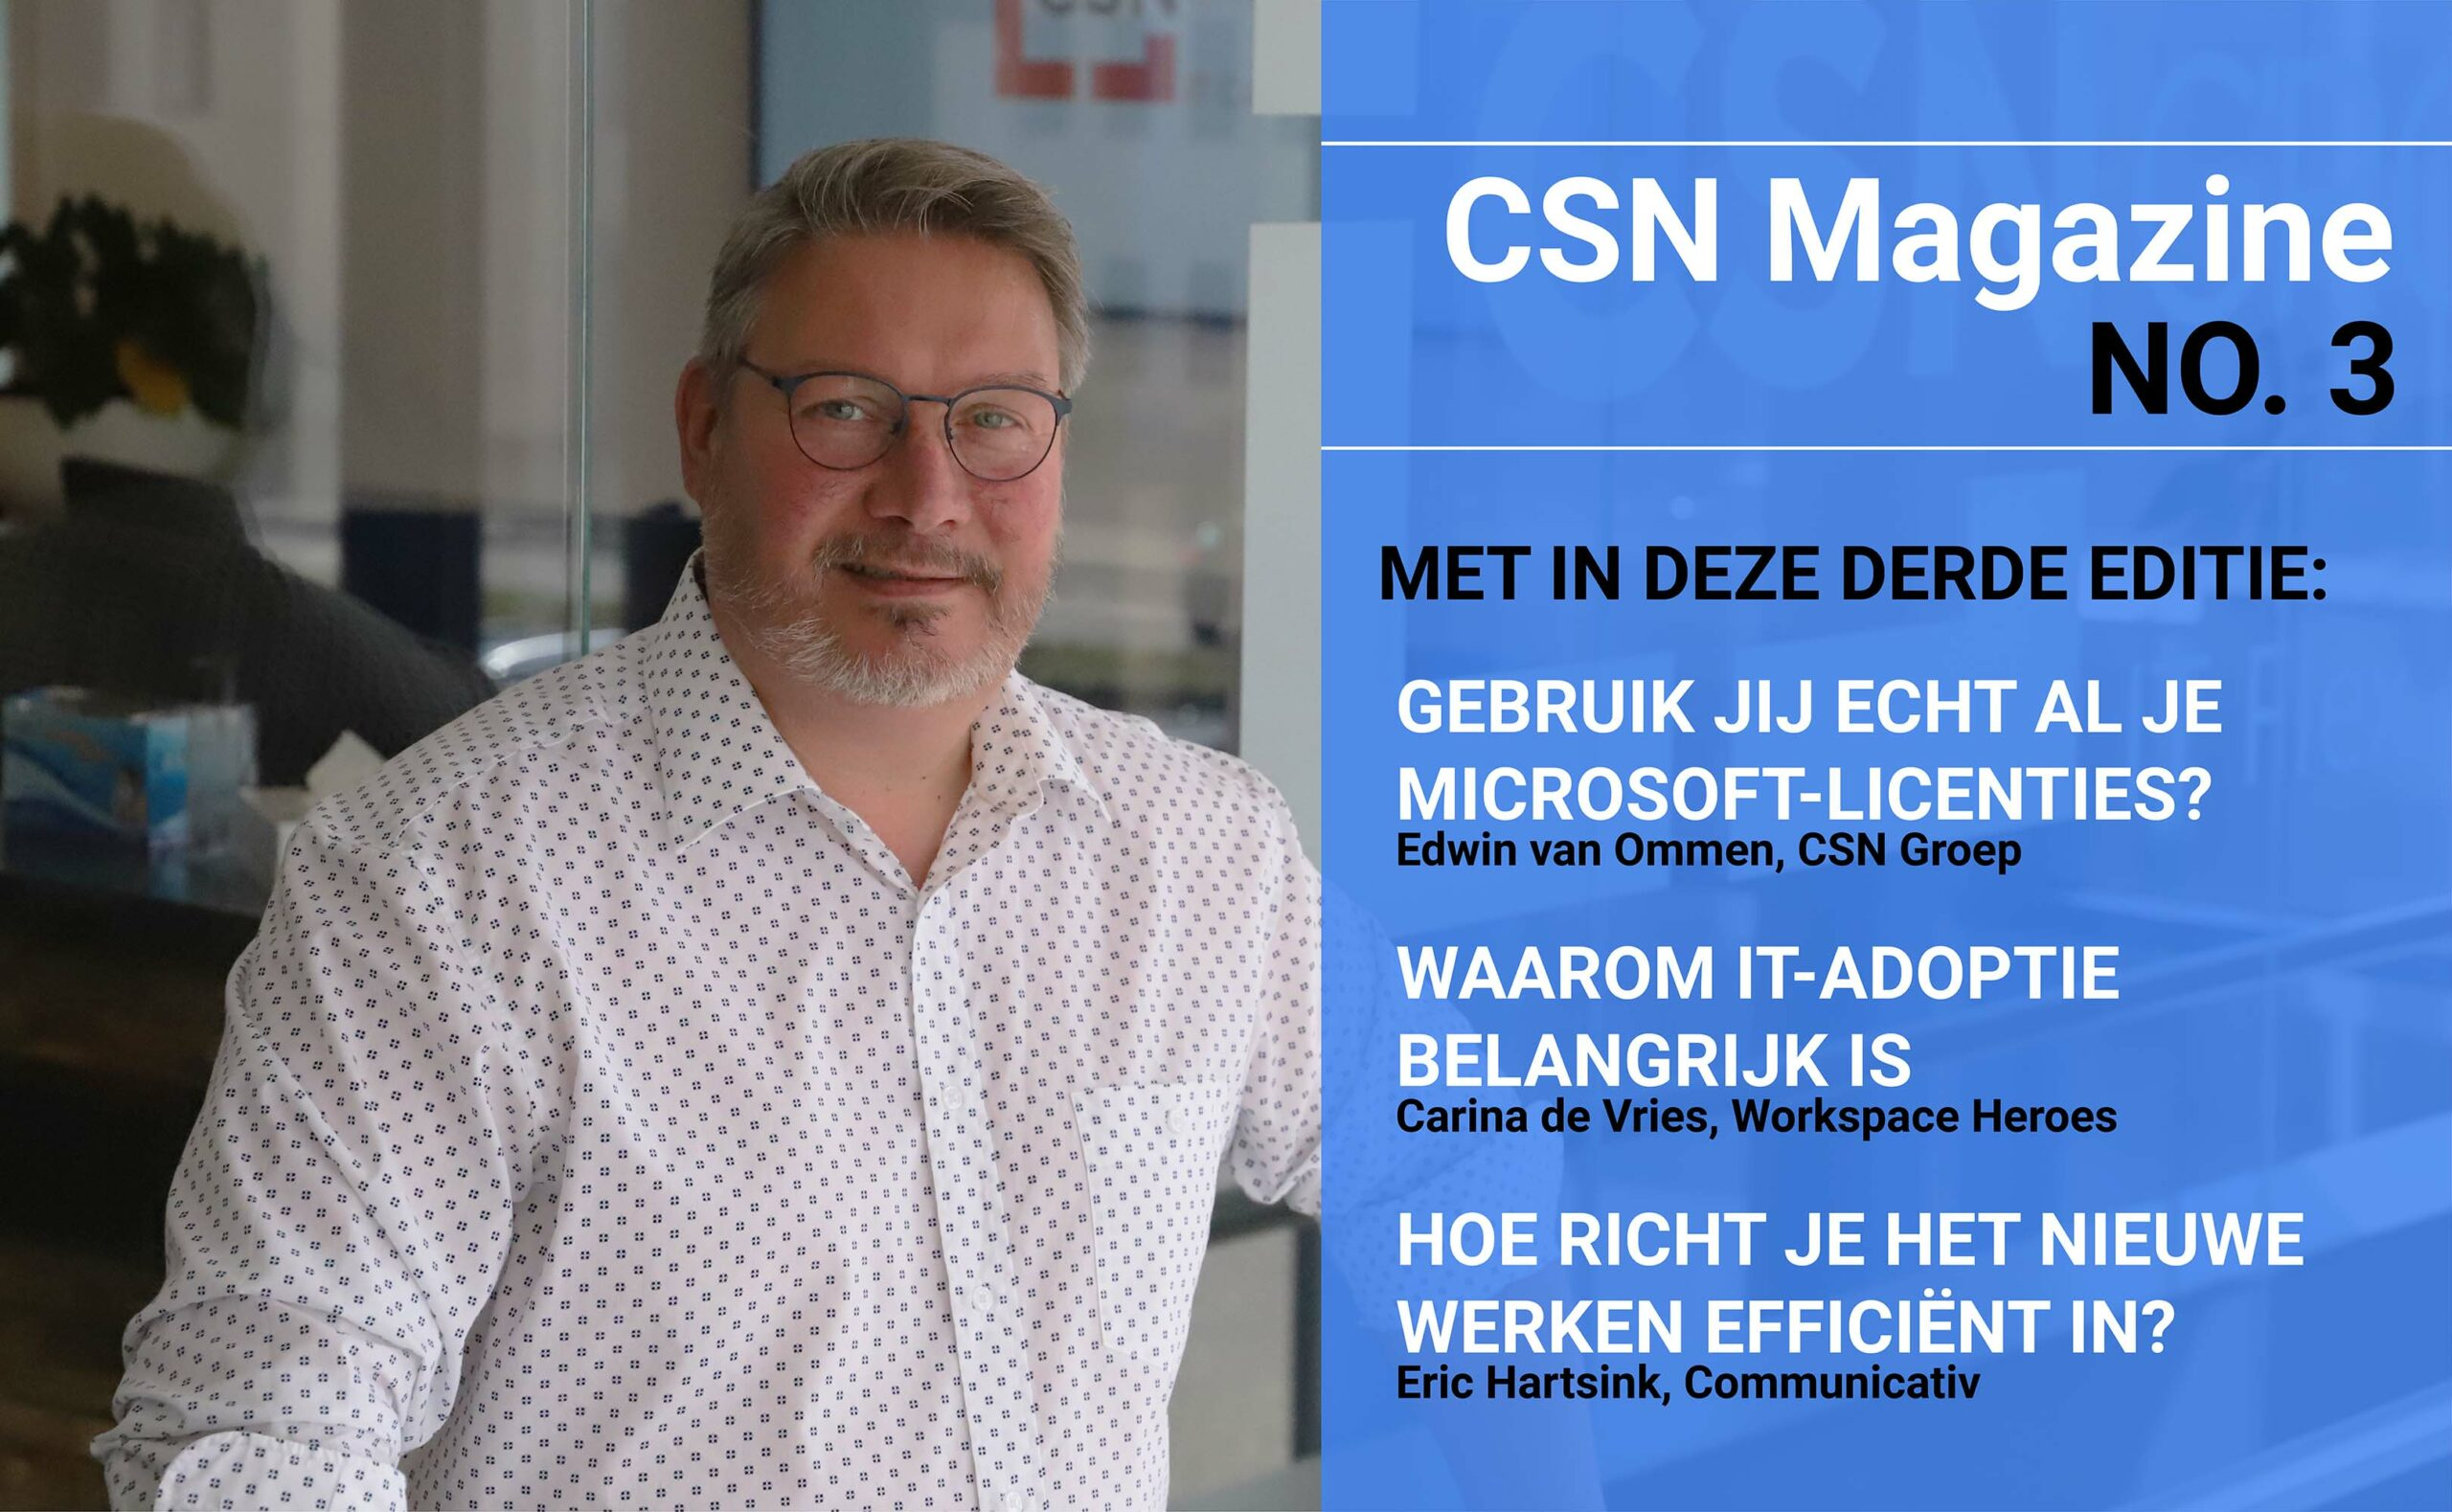 CSN Magazine NO3